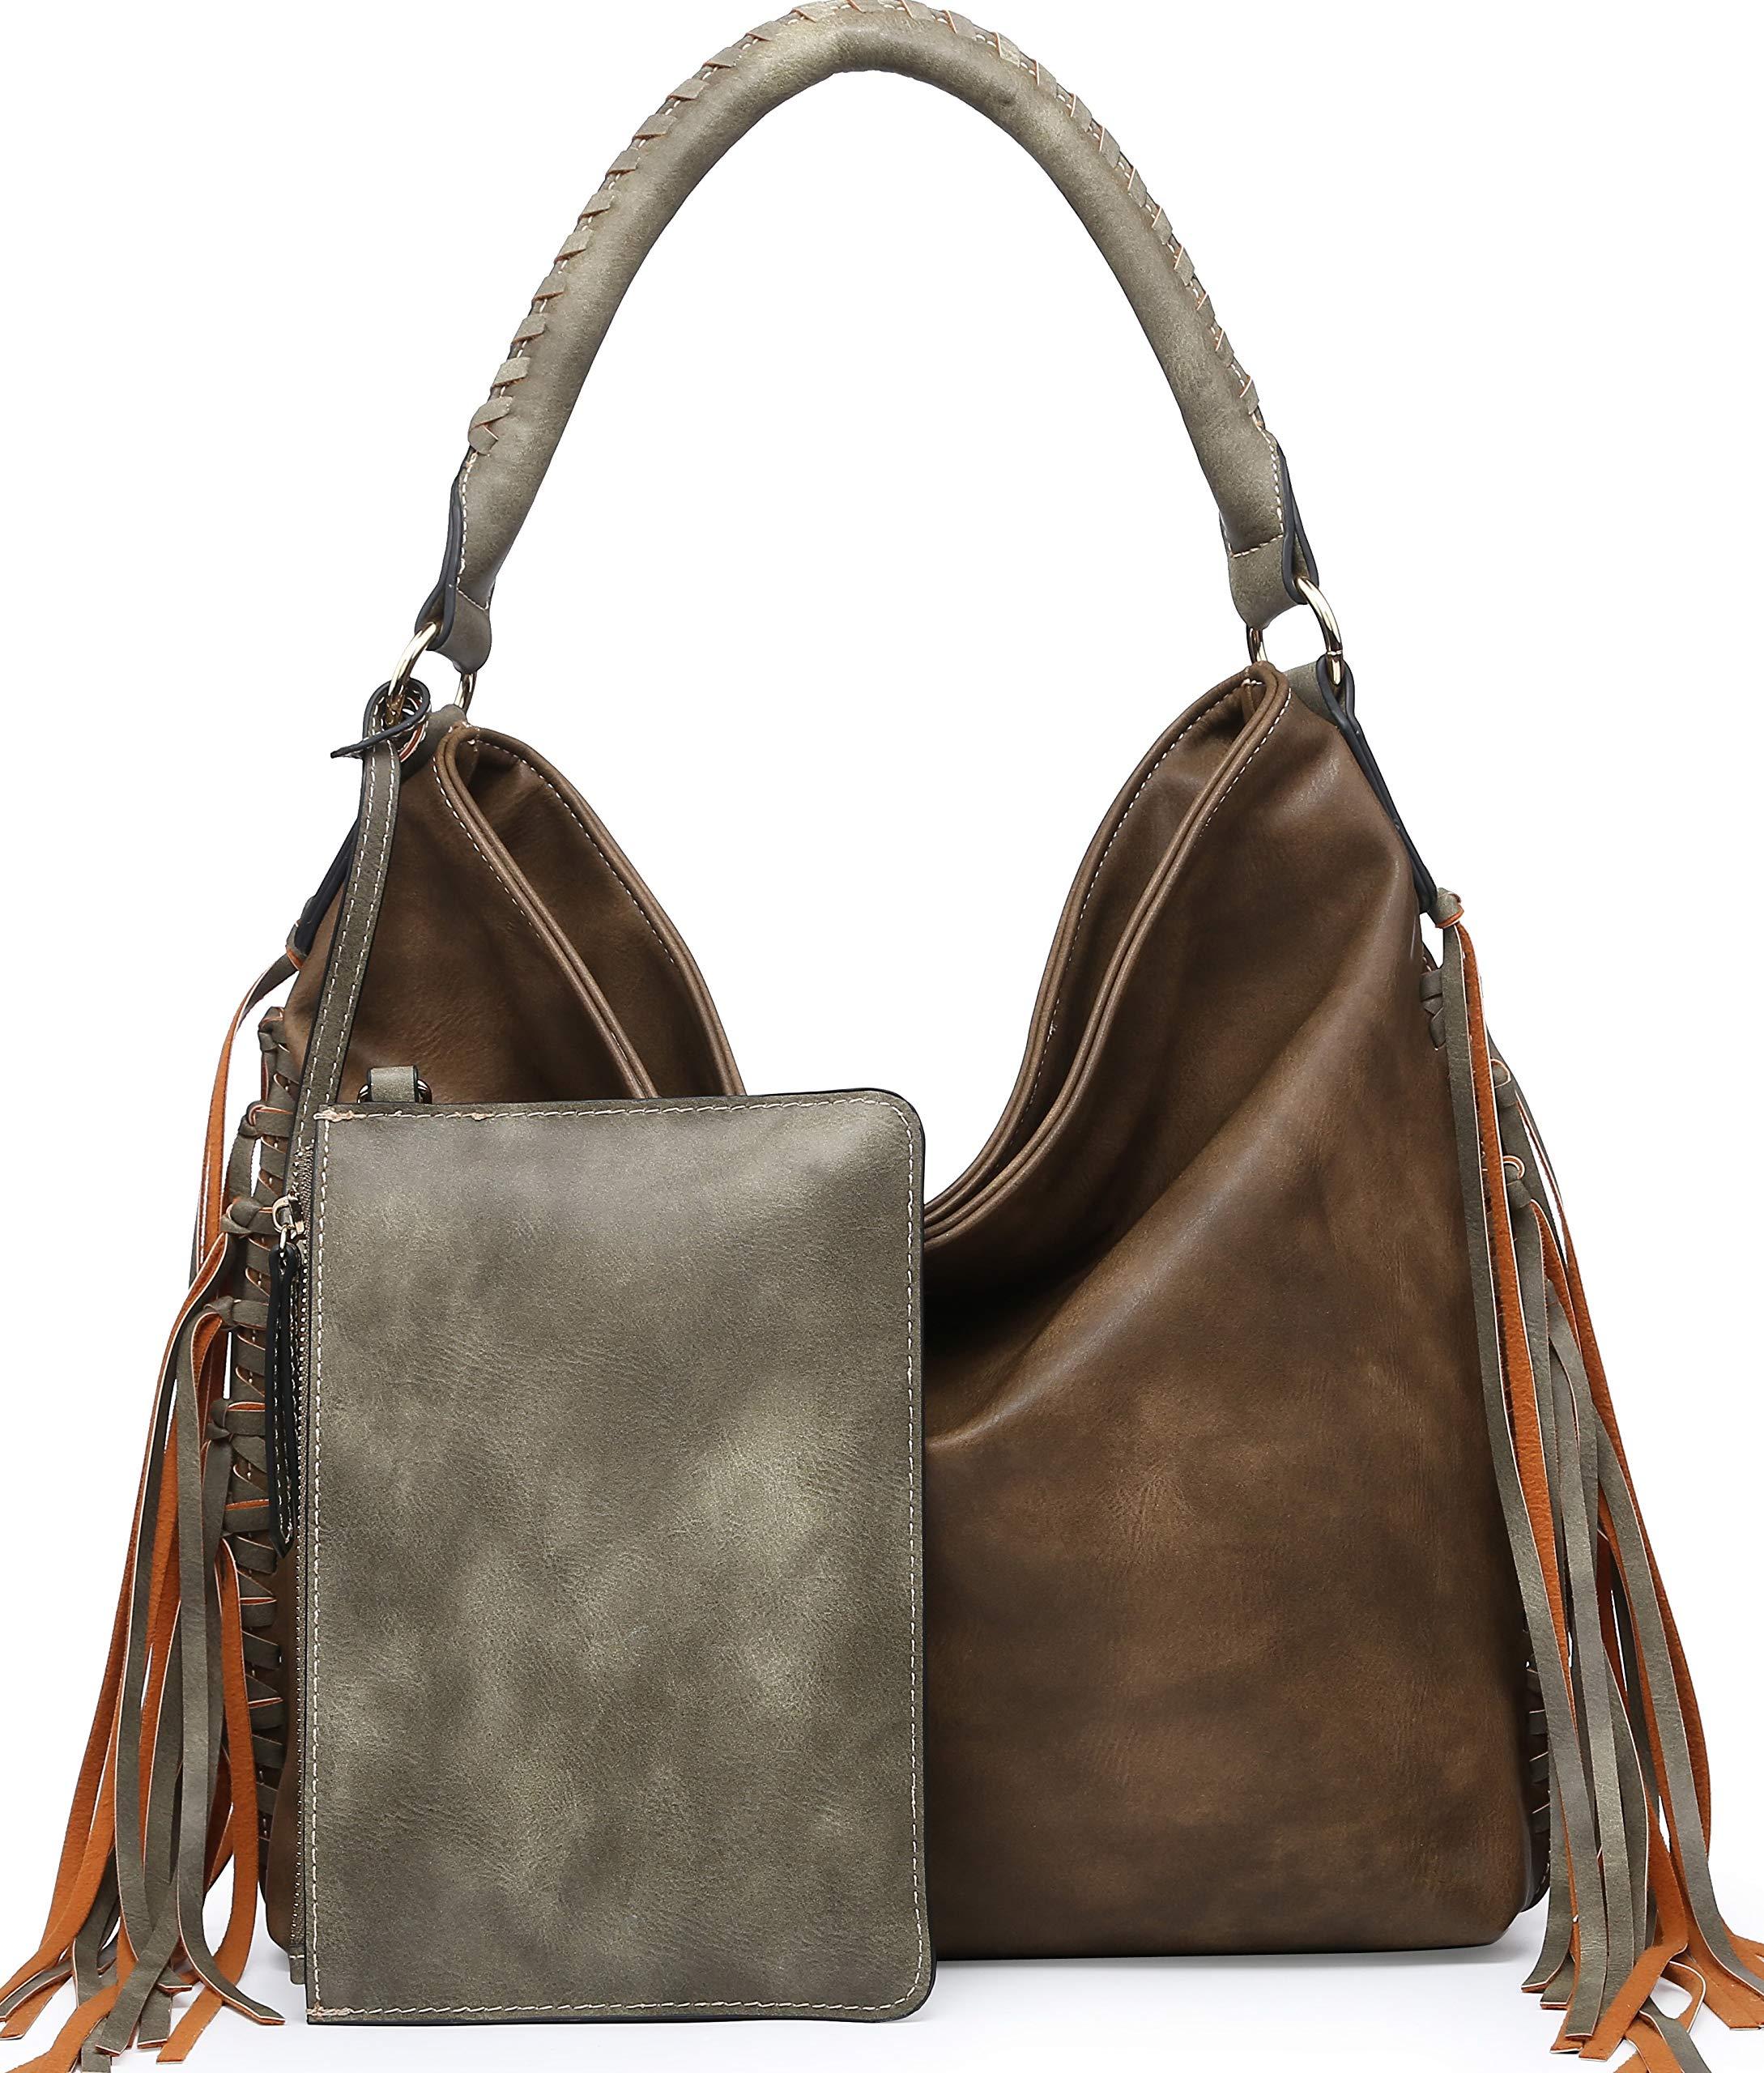 SHOMICO Hobo Bag for Women Boho Purses and Handbags Fringe Bags Taupe Brown Large Big Oversize (Neutral khaki)